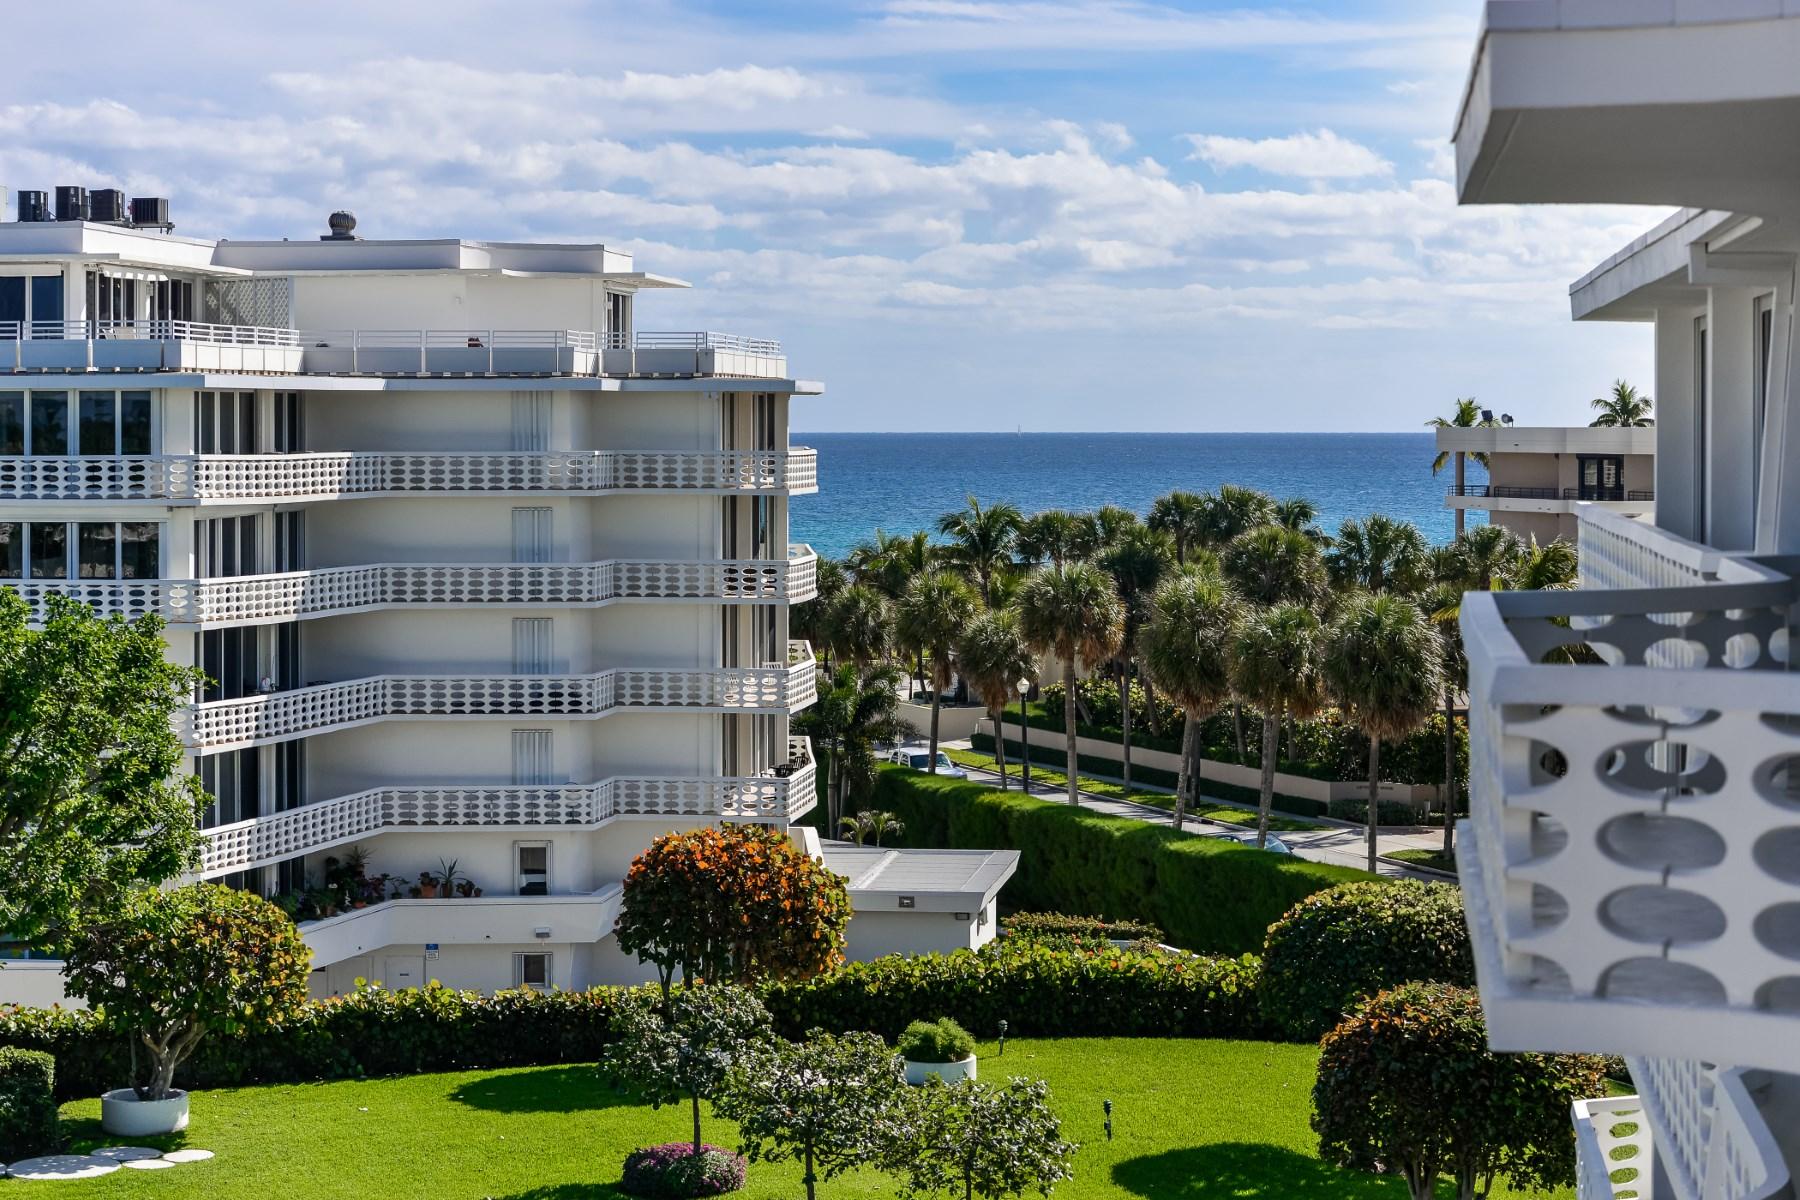 Condomínio para Venda às In Town Turnkey 130 Sunrise Ave Apt 503 Palm Beach, Florida 33480 Estados Unidos